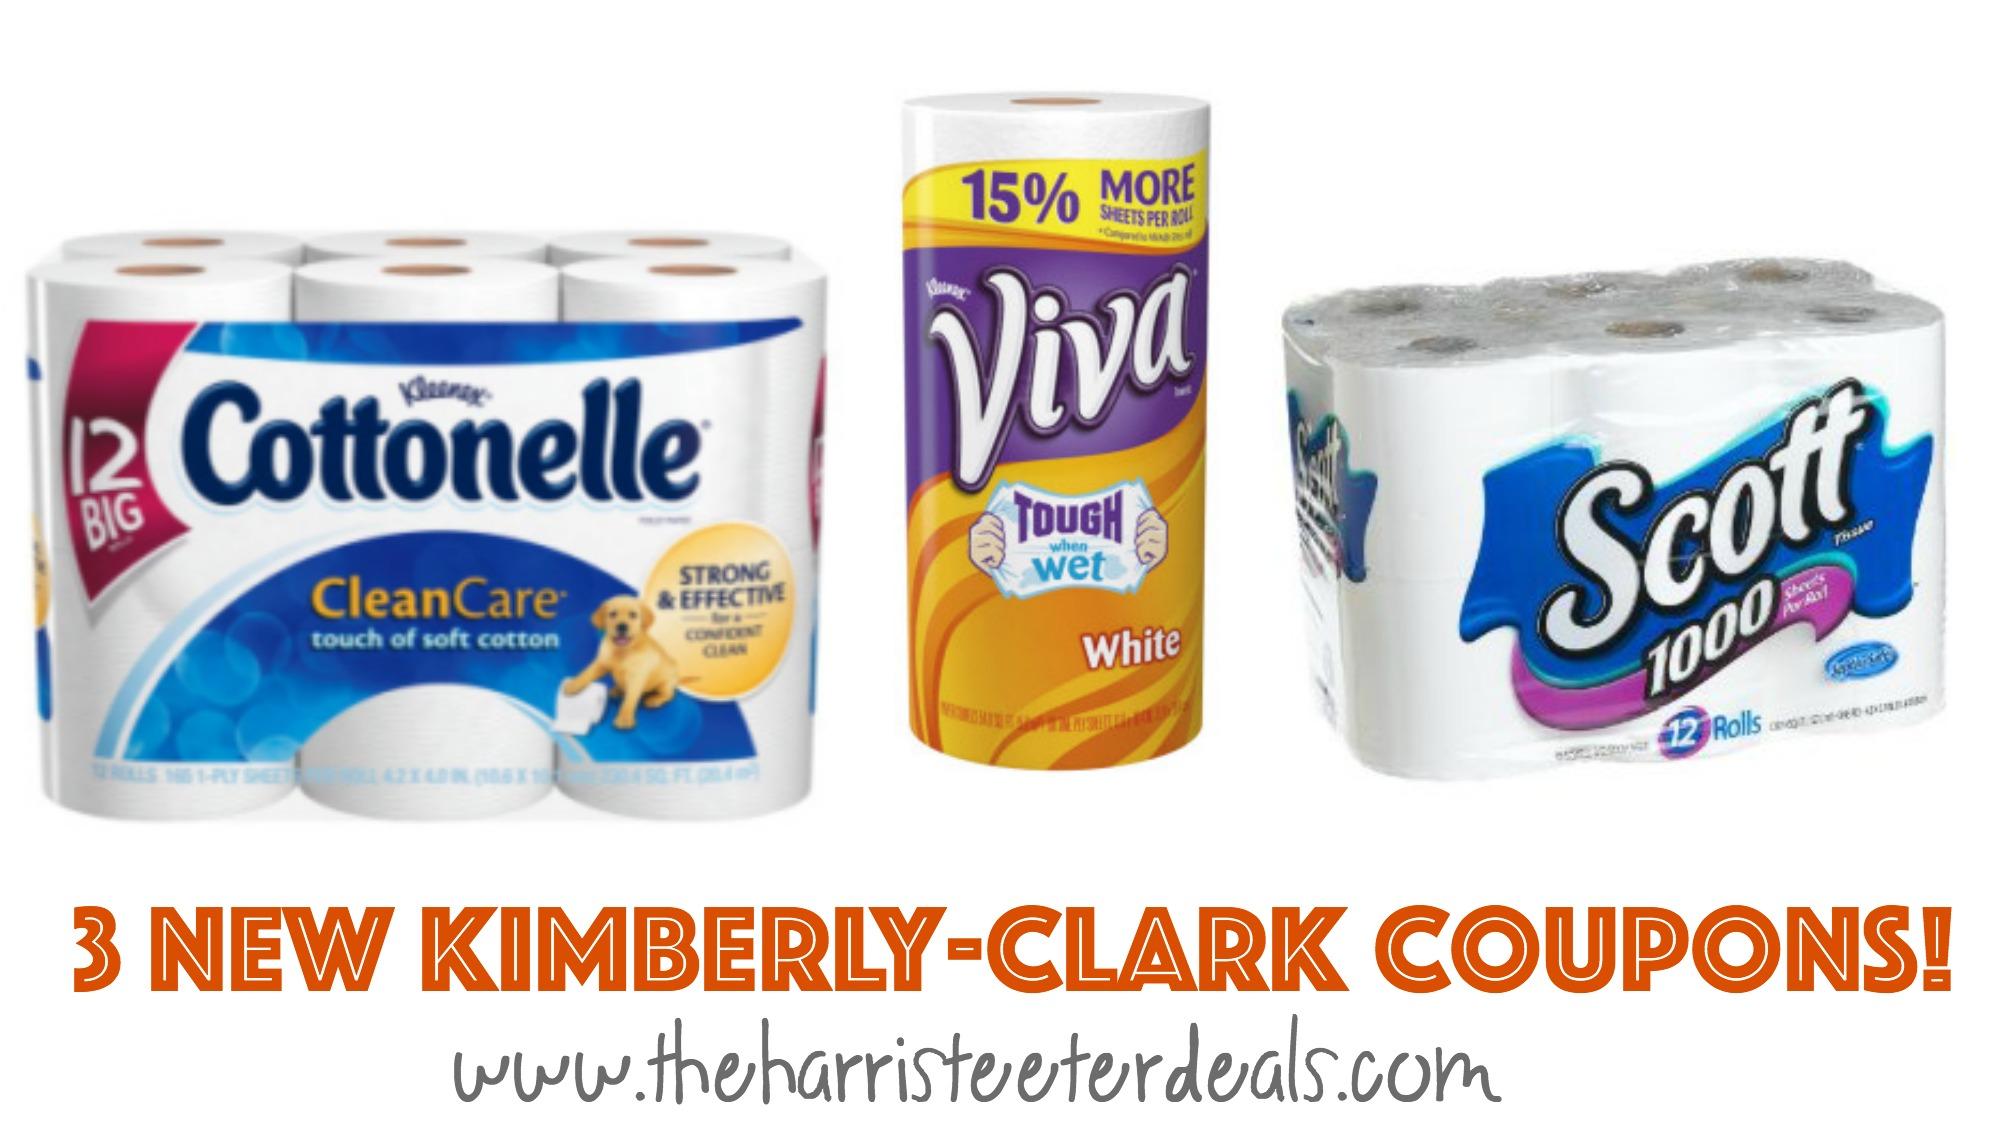 Kimberly clark poise coupons